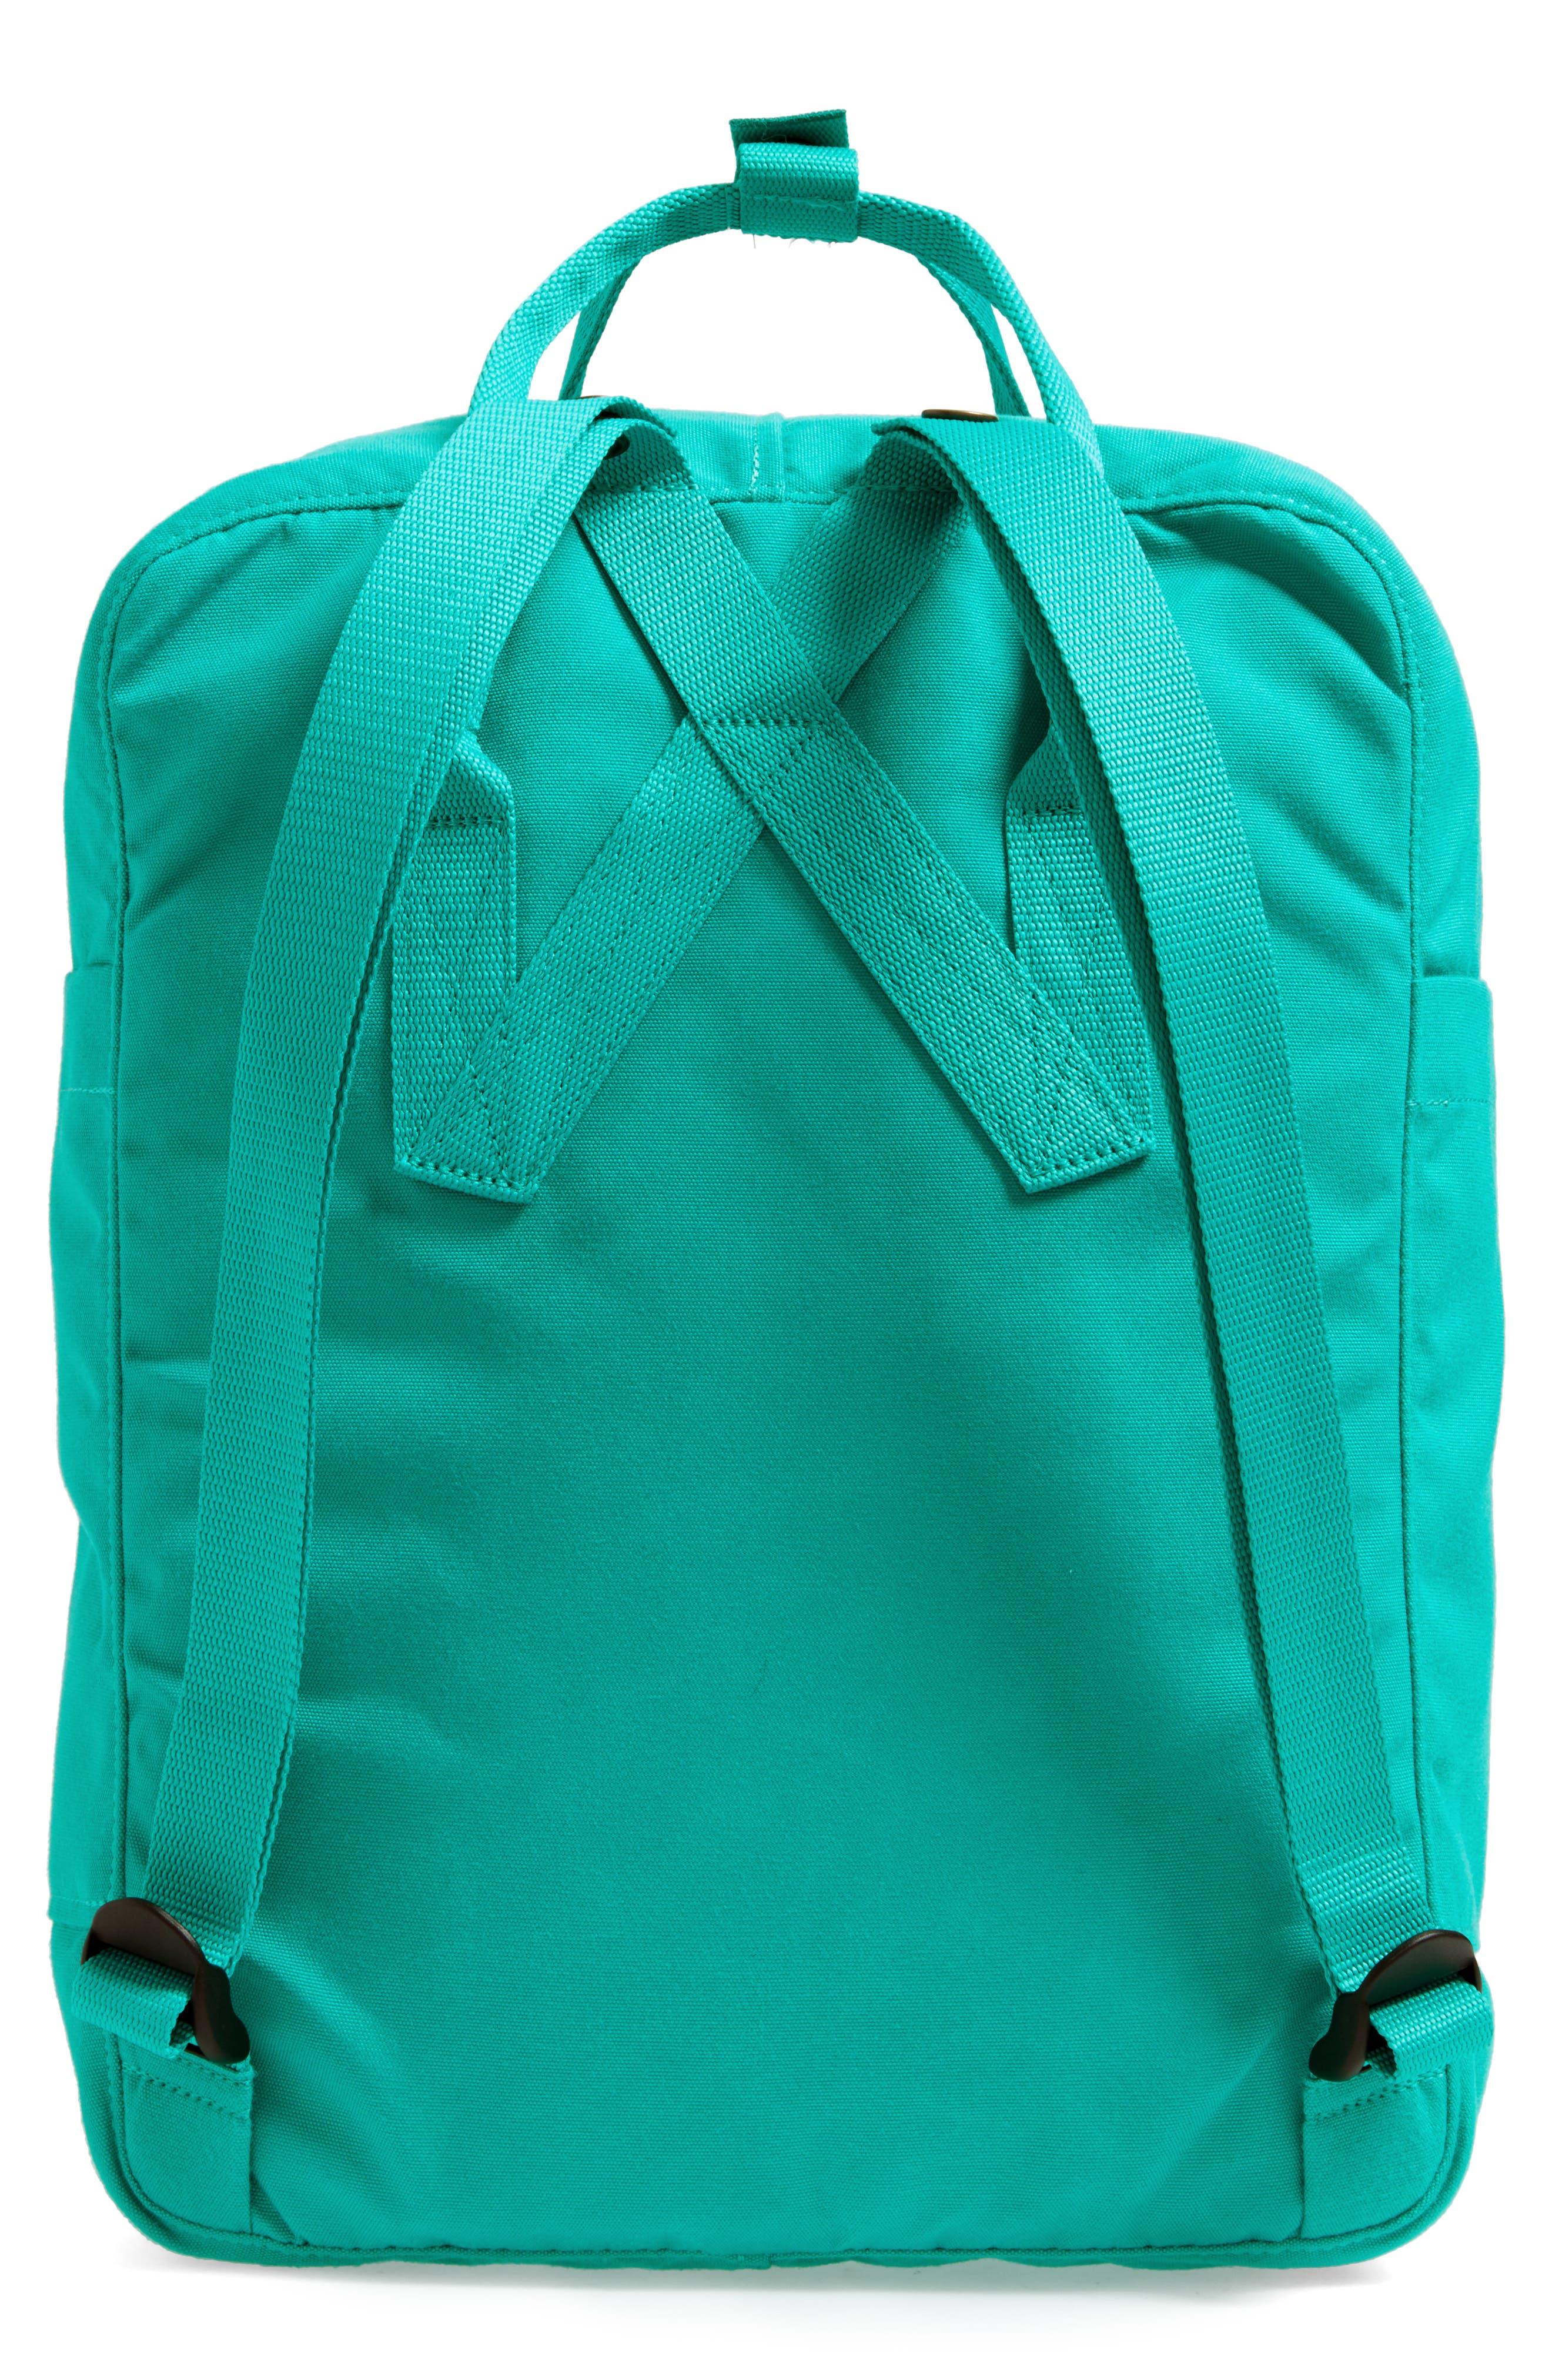 Re-Kånken Water Resistant Backpack,                             Alternate thumbnail 3, color,                             EMERALD